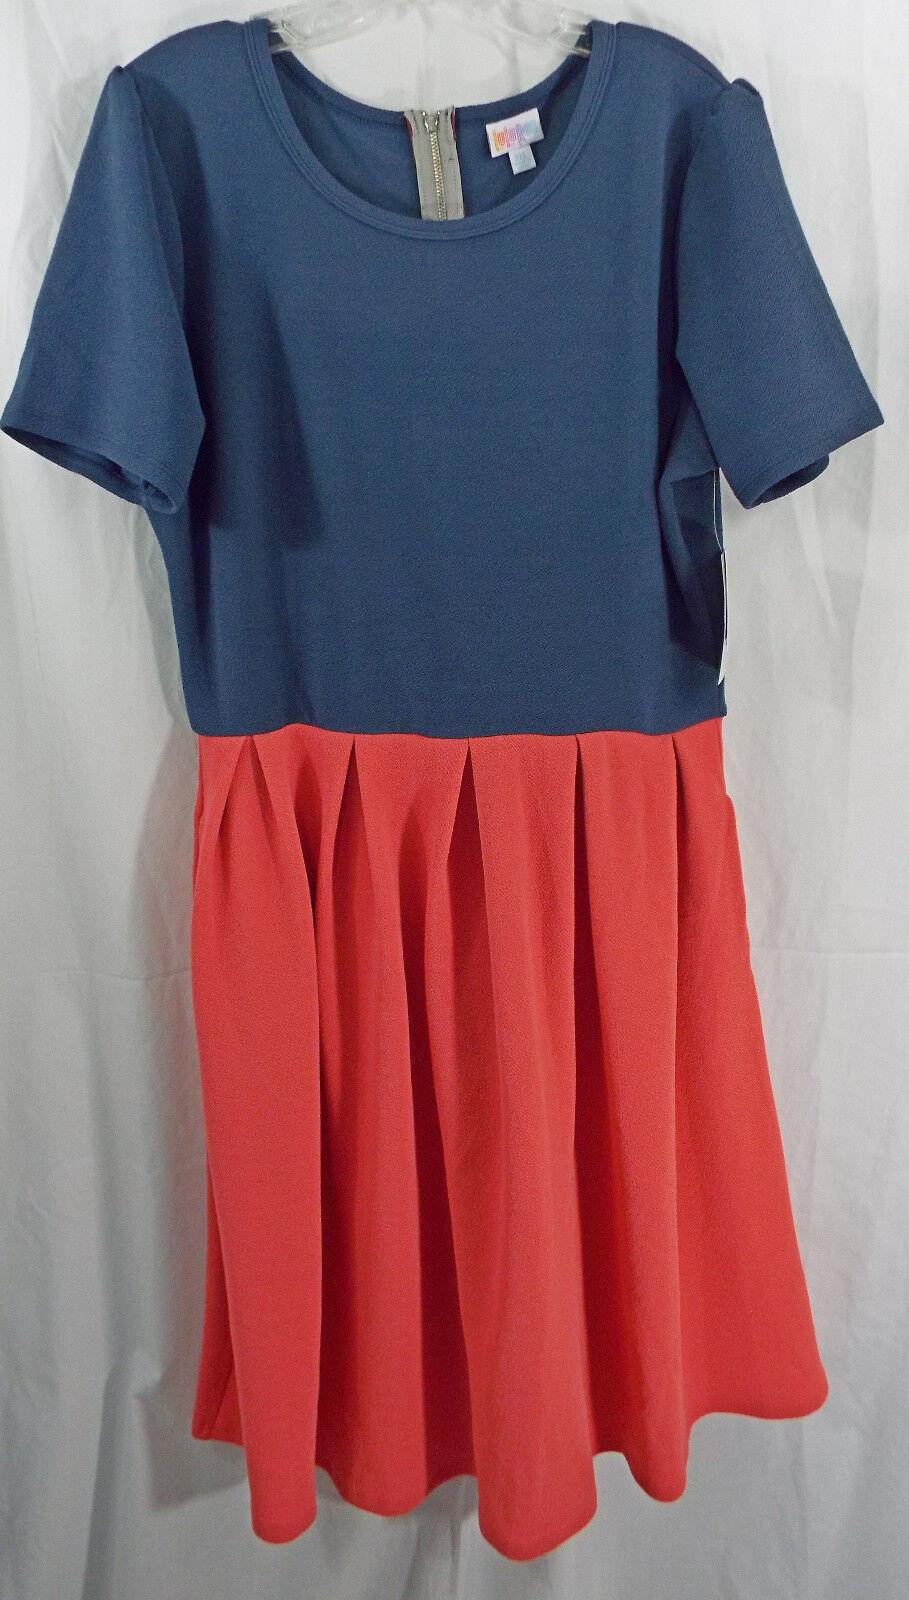 damen LuLaRoe Dress 2XL Amelia Dark Blau Dark Salmon Rosa Texturot NWT